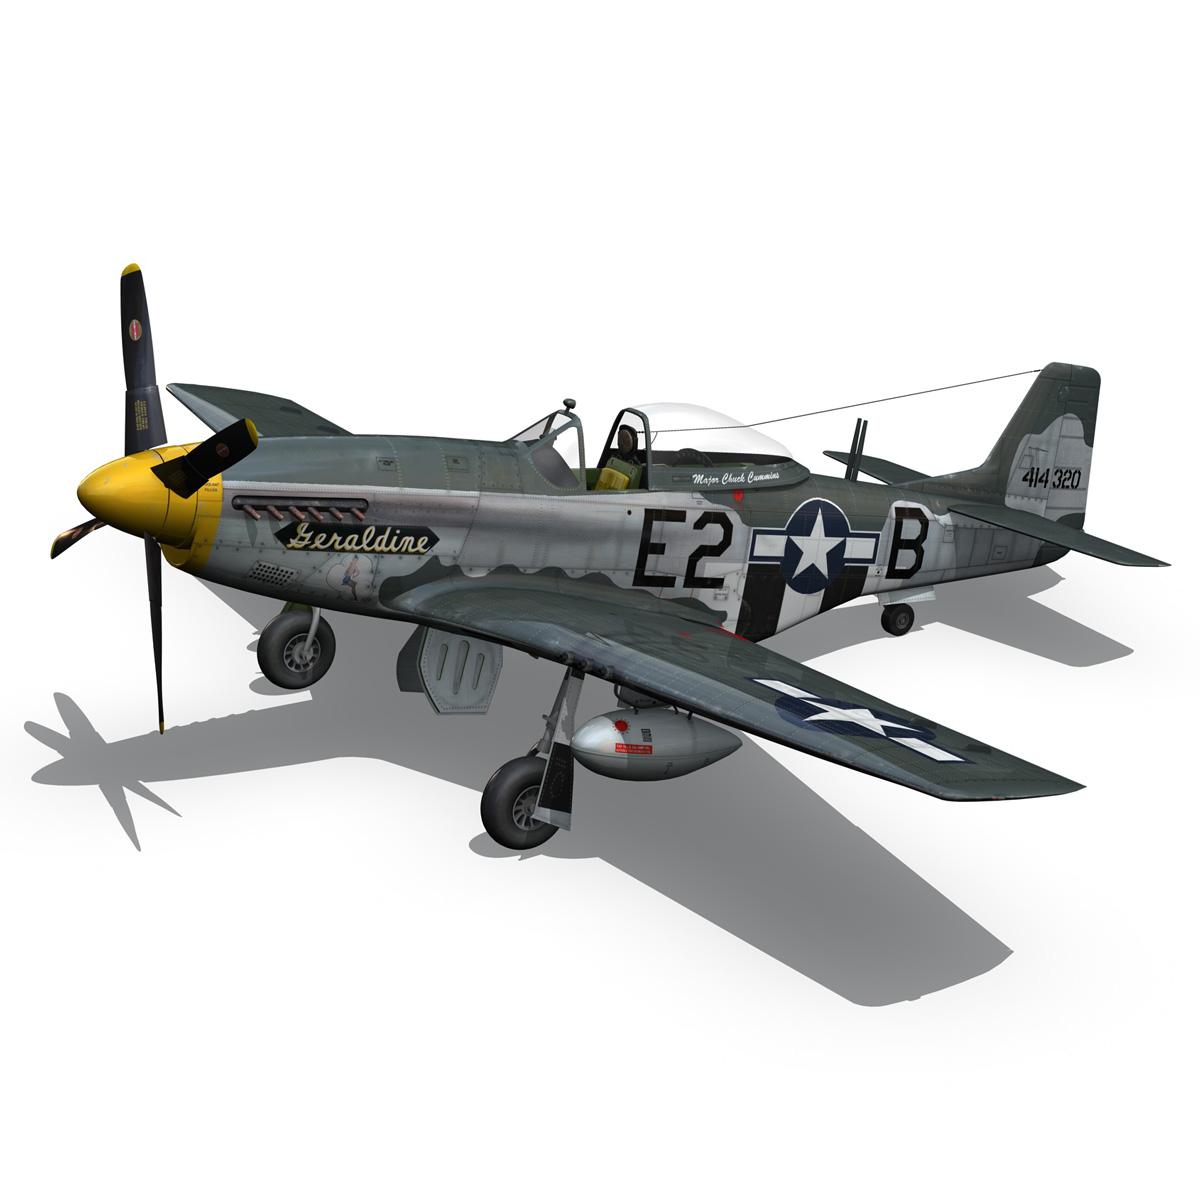 North American P-51D - Geraldine 3d model fbx c4d lwo obj 265946